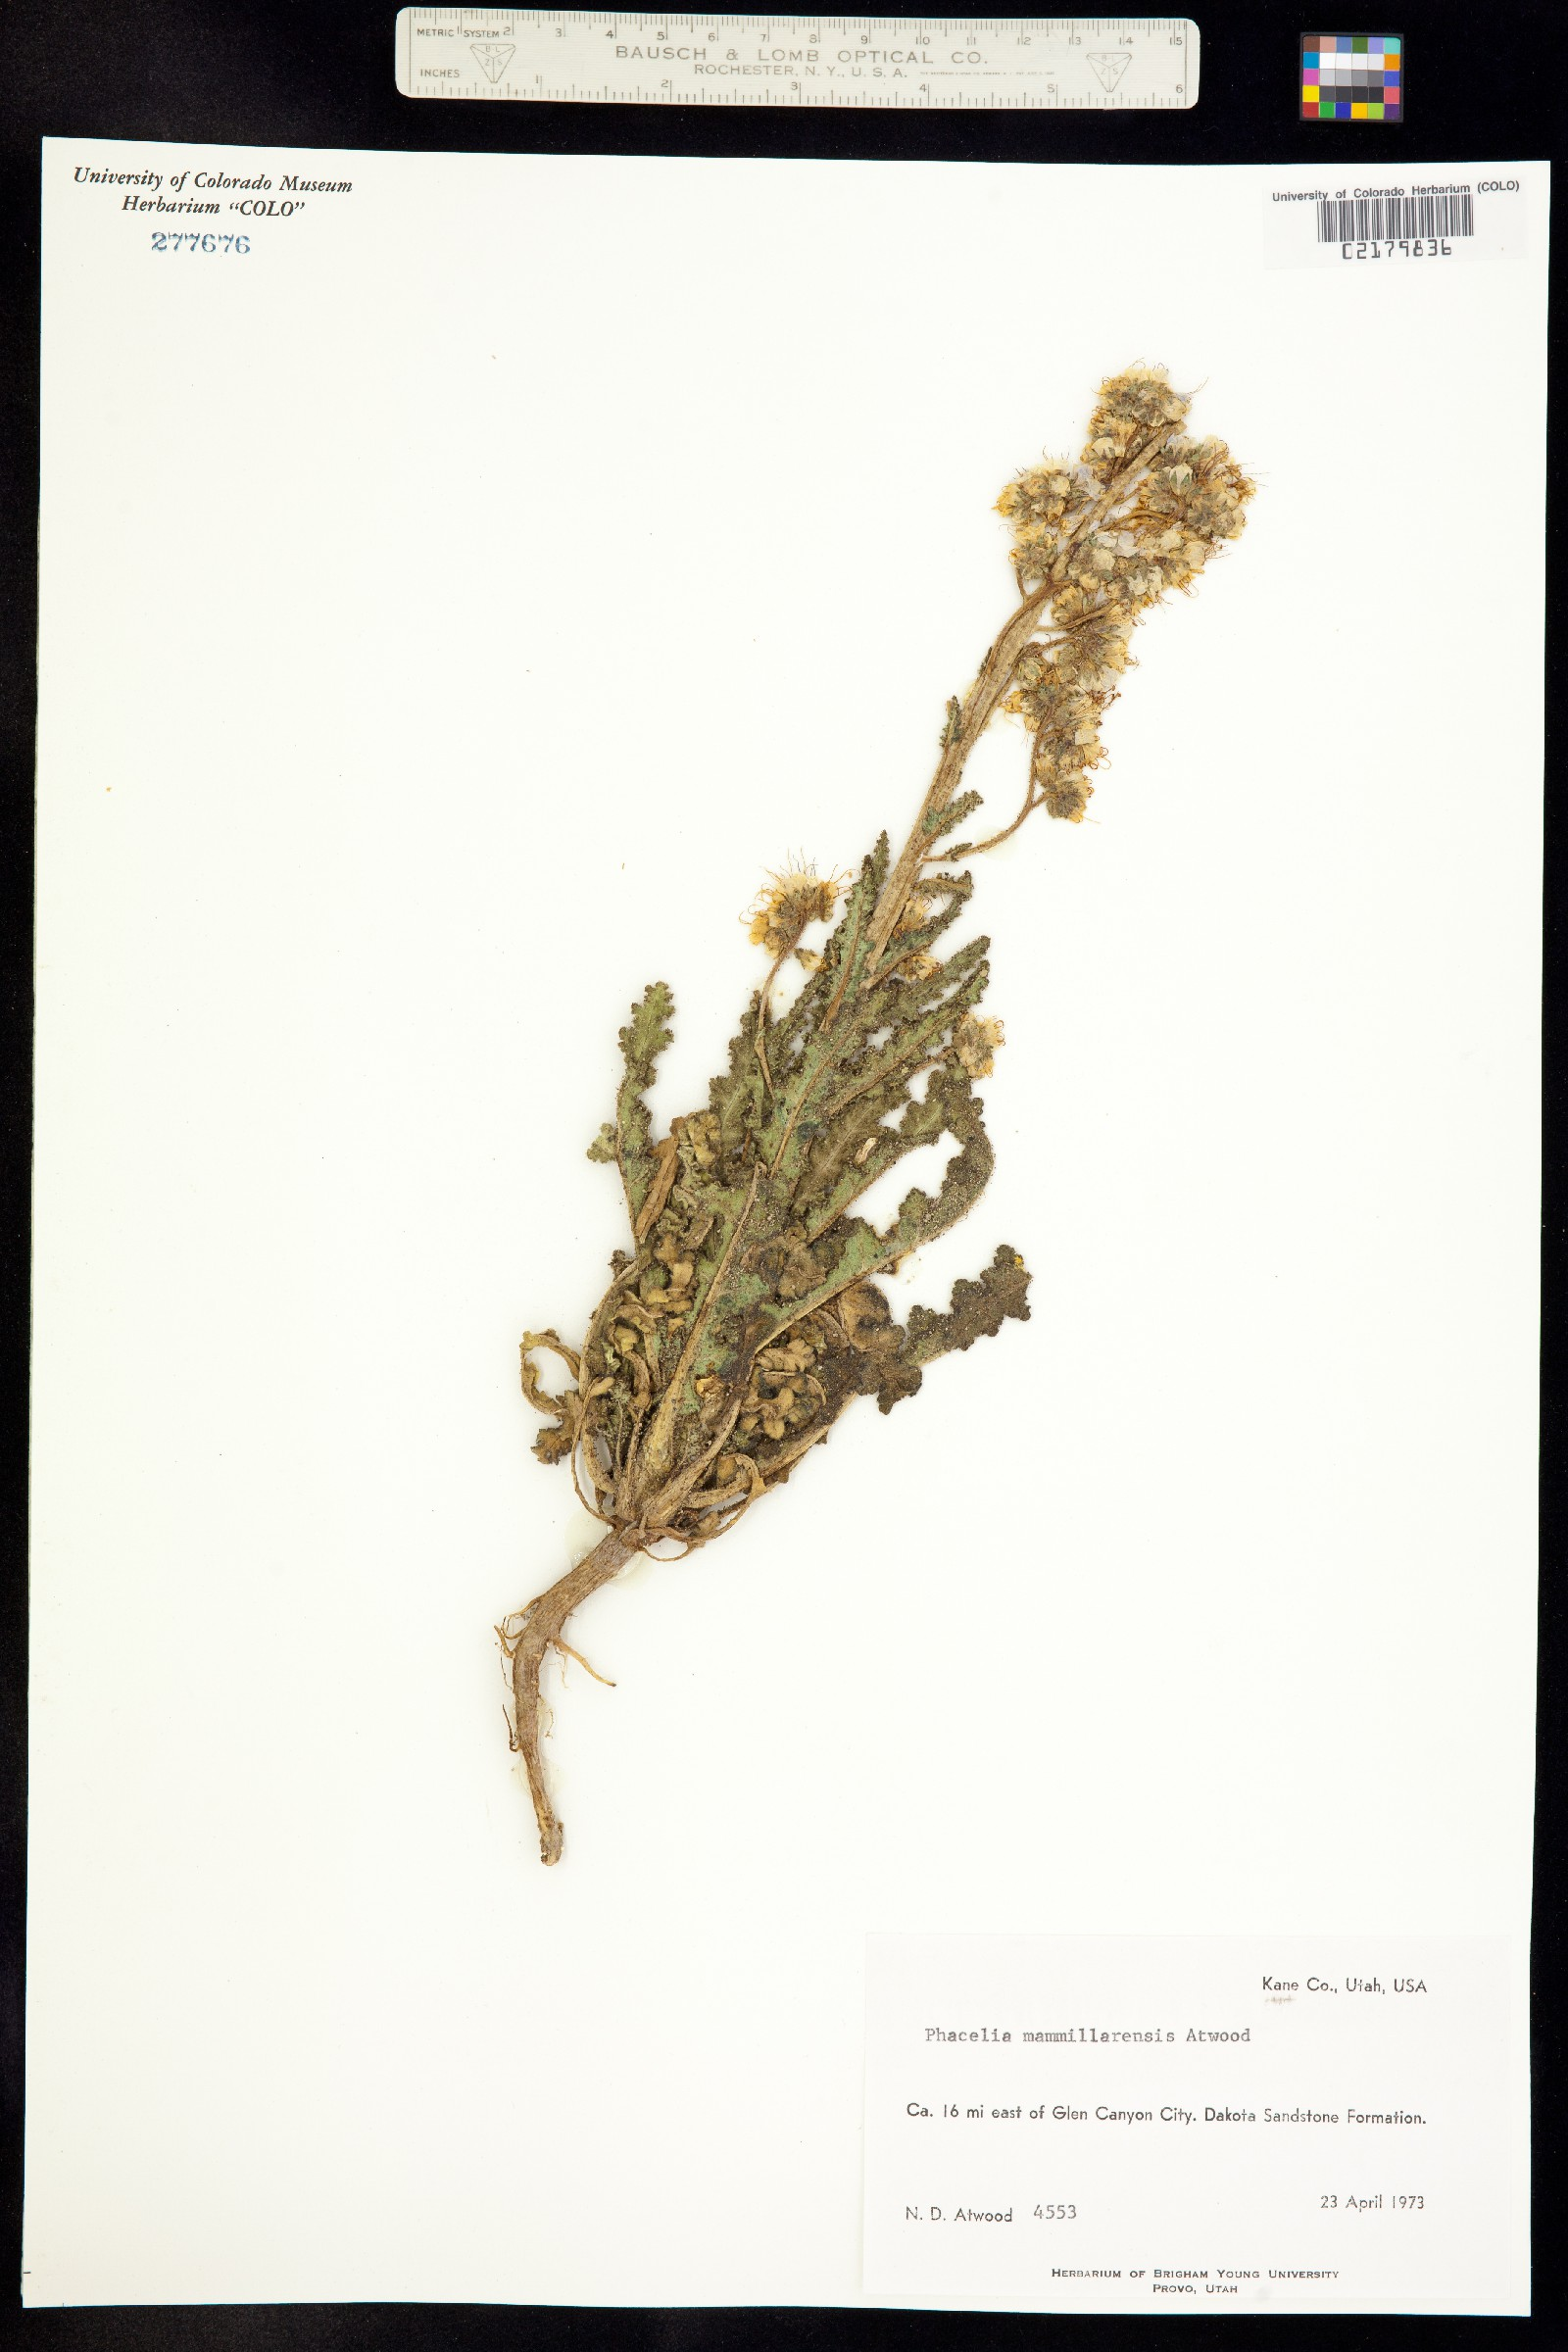 Phacelia mammillarensis image